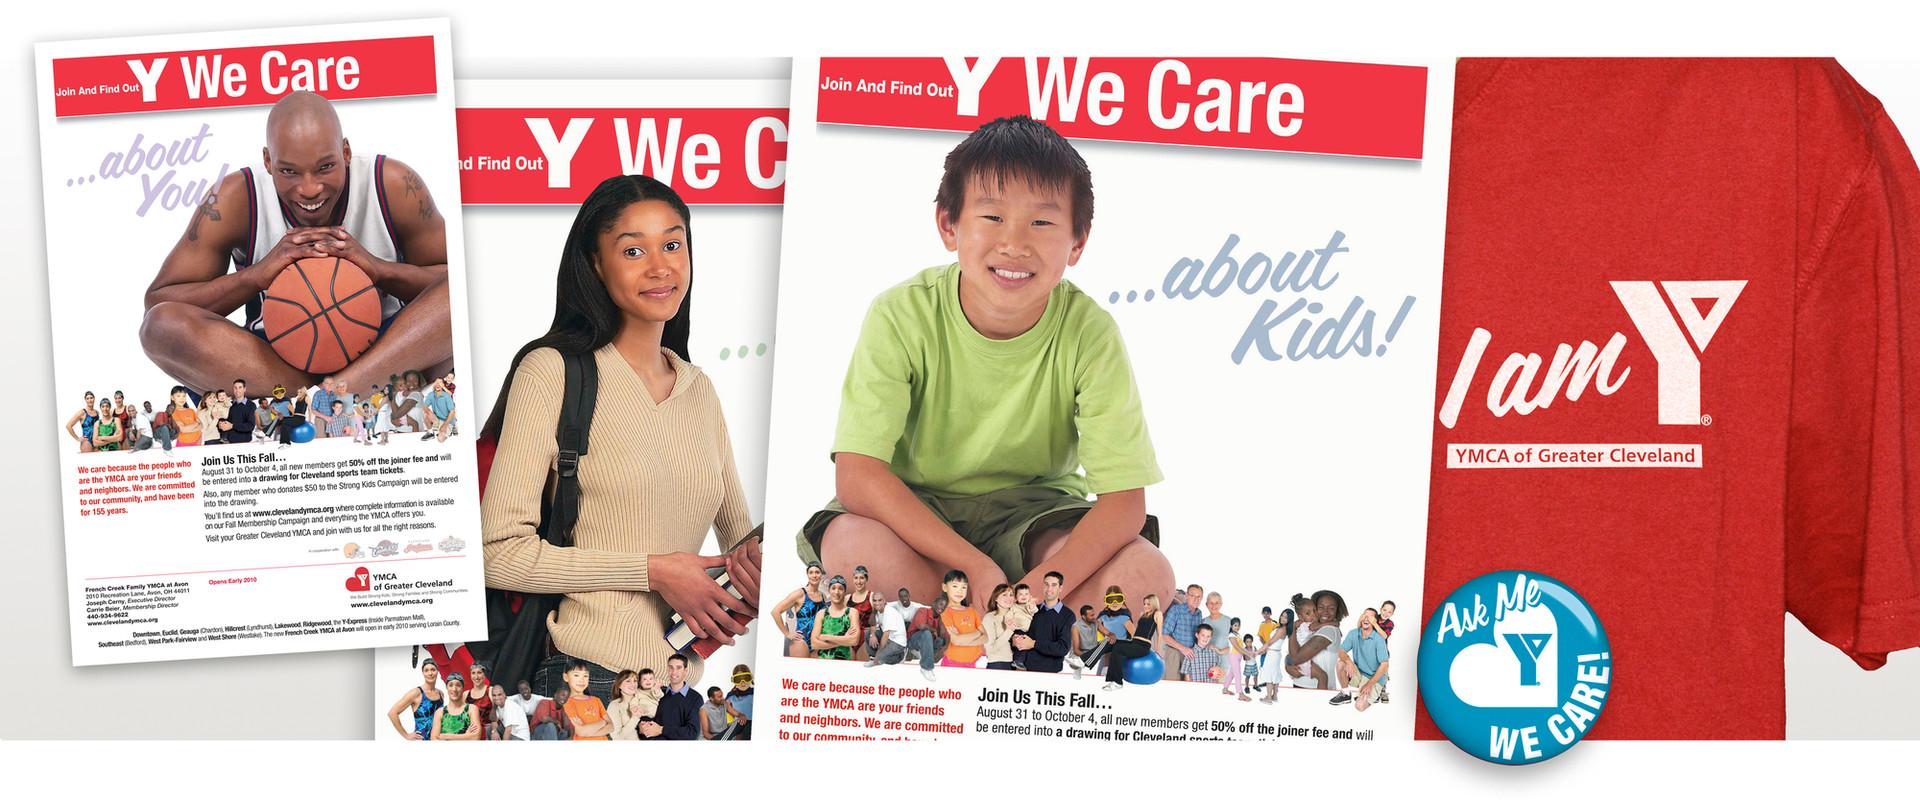 YMCA Annual Campaign